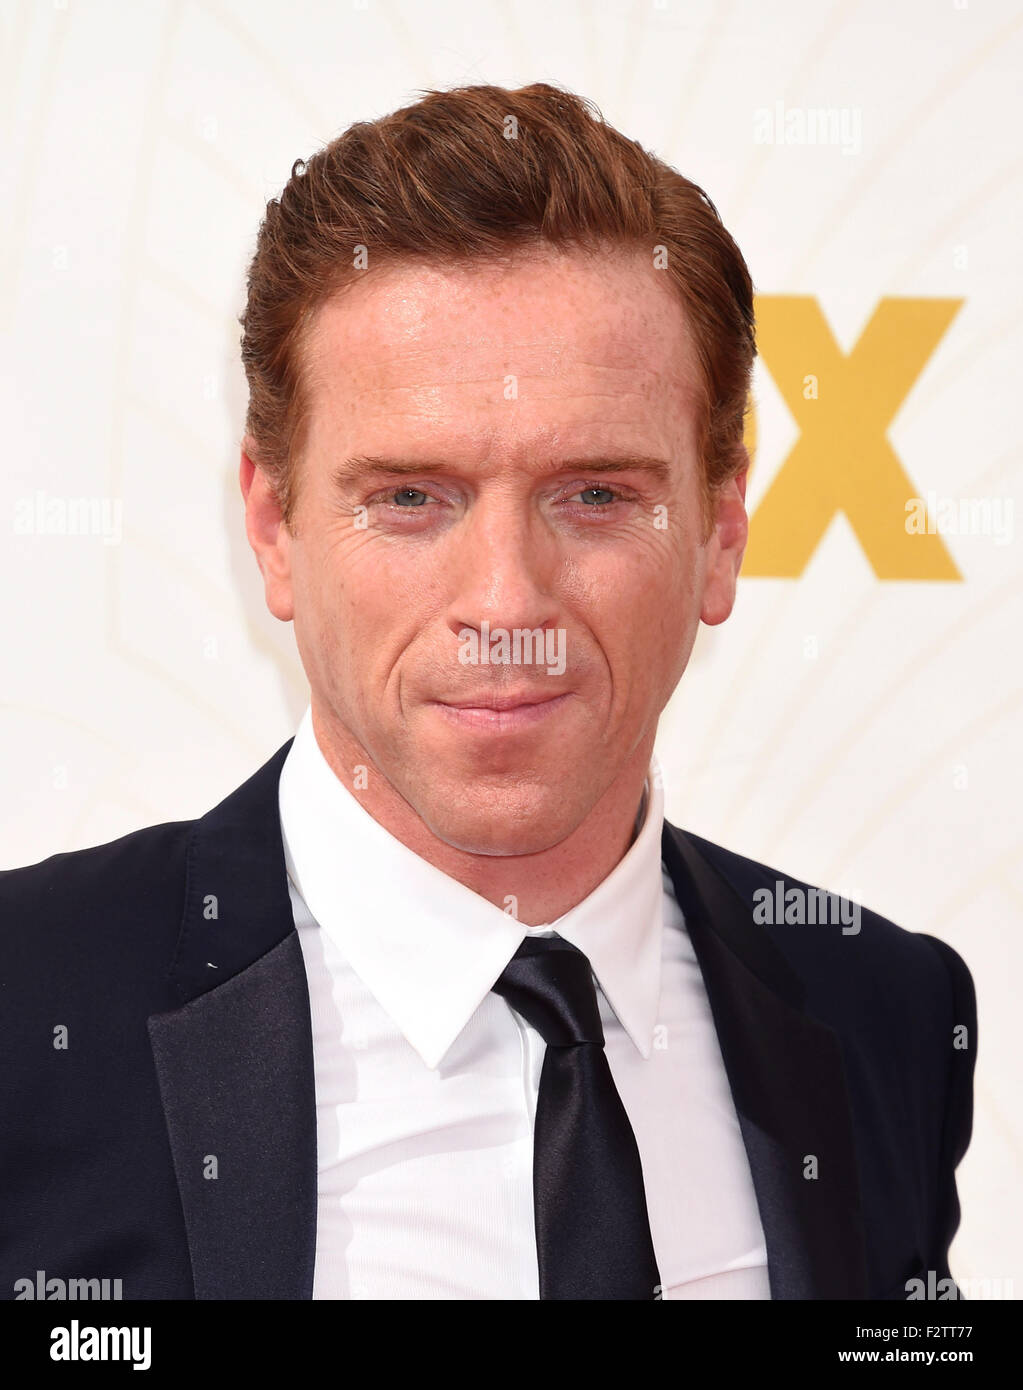 DAMIAN LEWIS  English film actor in September 2015. Photo Jeffrey Mayer - Stock Image